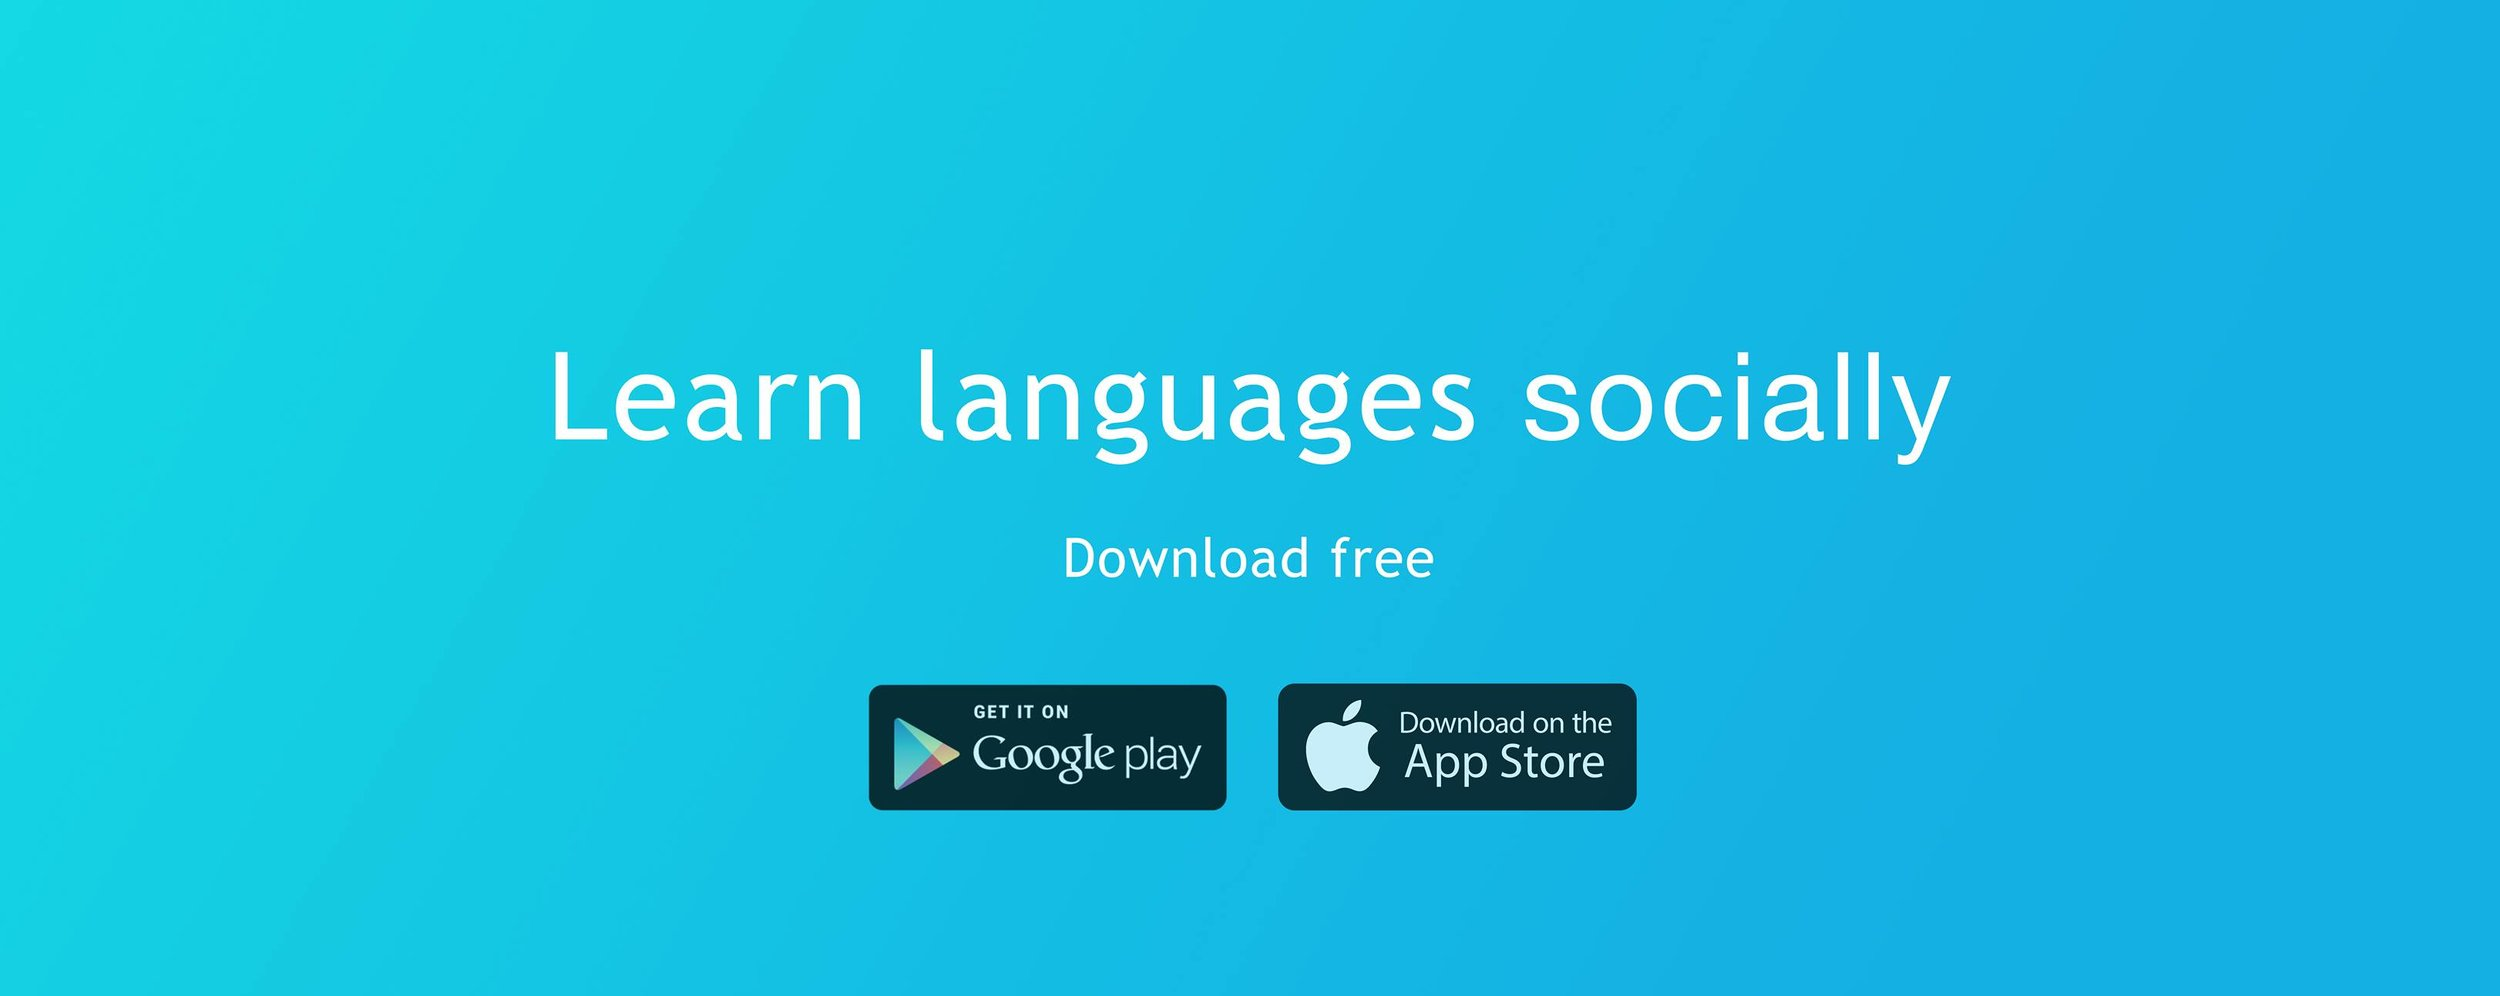 learn languages socially.jpg